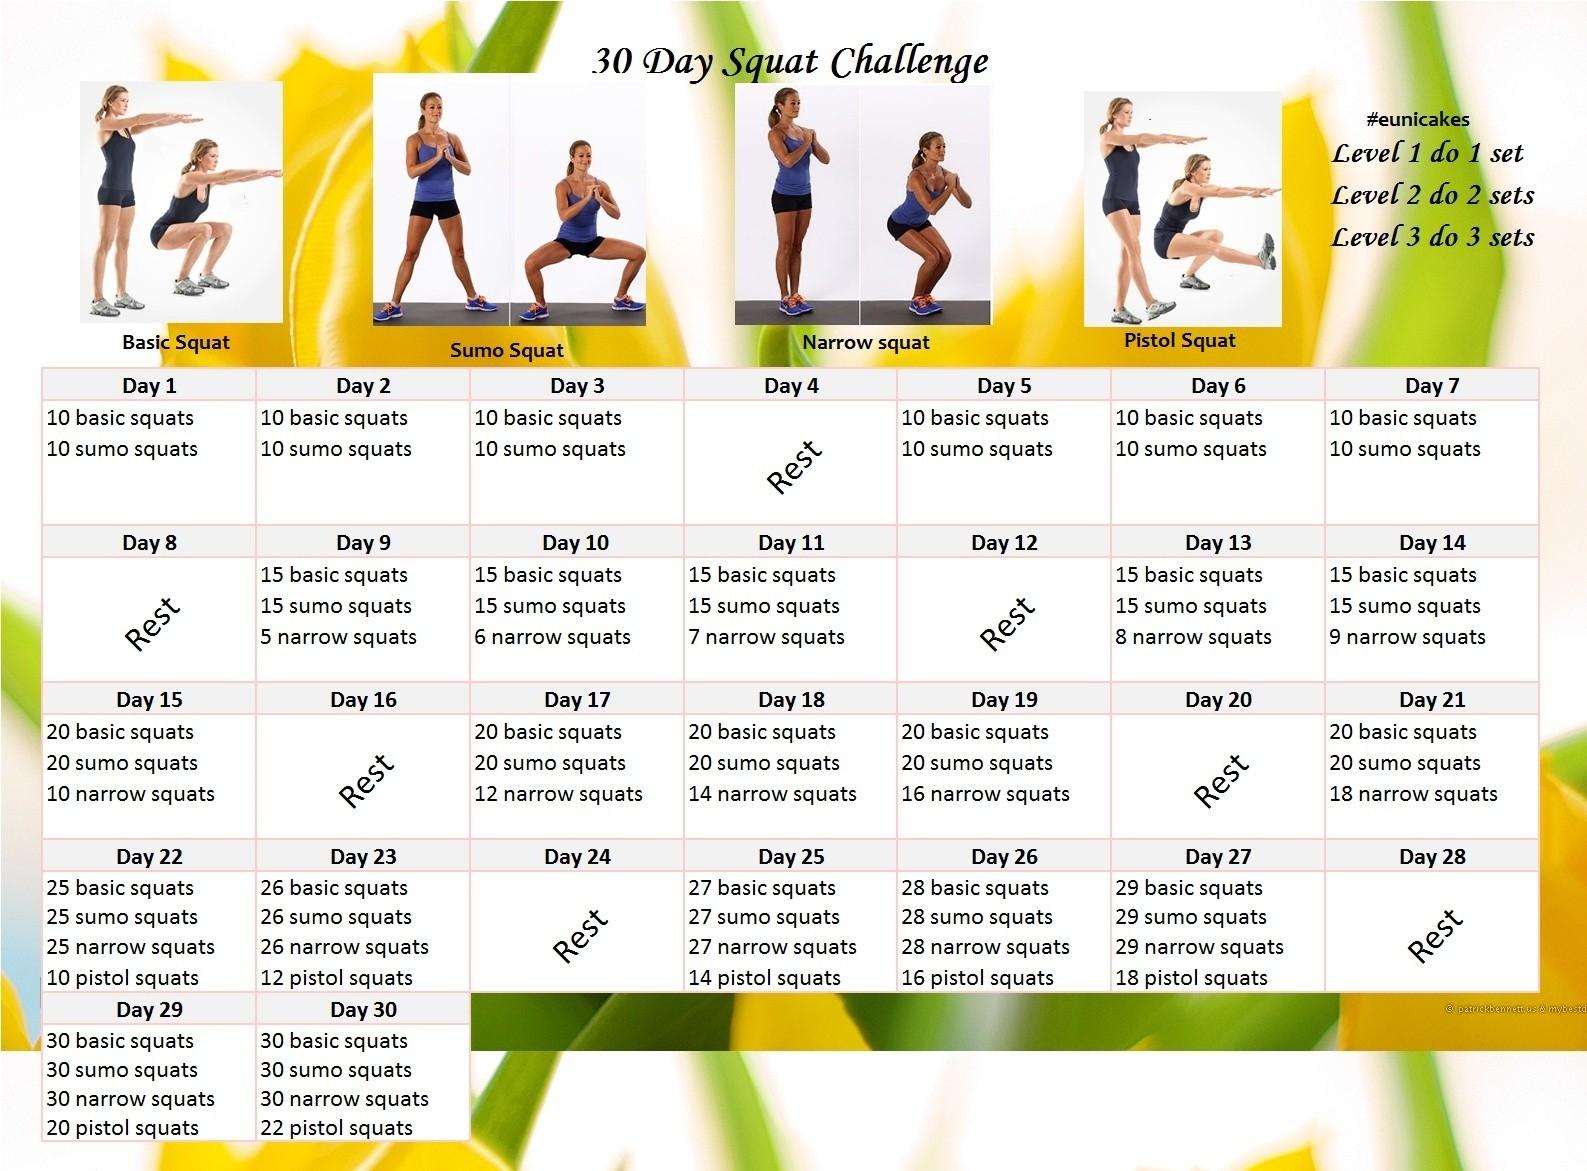 Fitness Challenge: 30 Day Squat Calendar Challenge | Eunicakes  30 Day Challenge Calendar